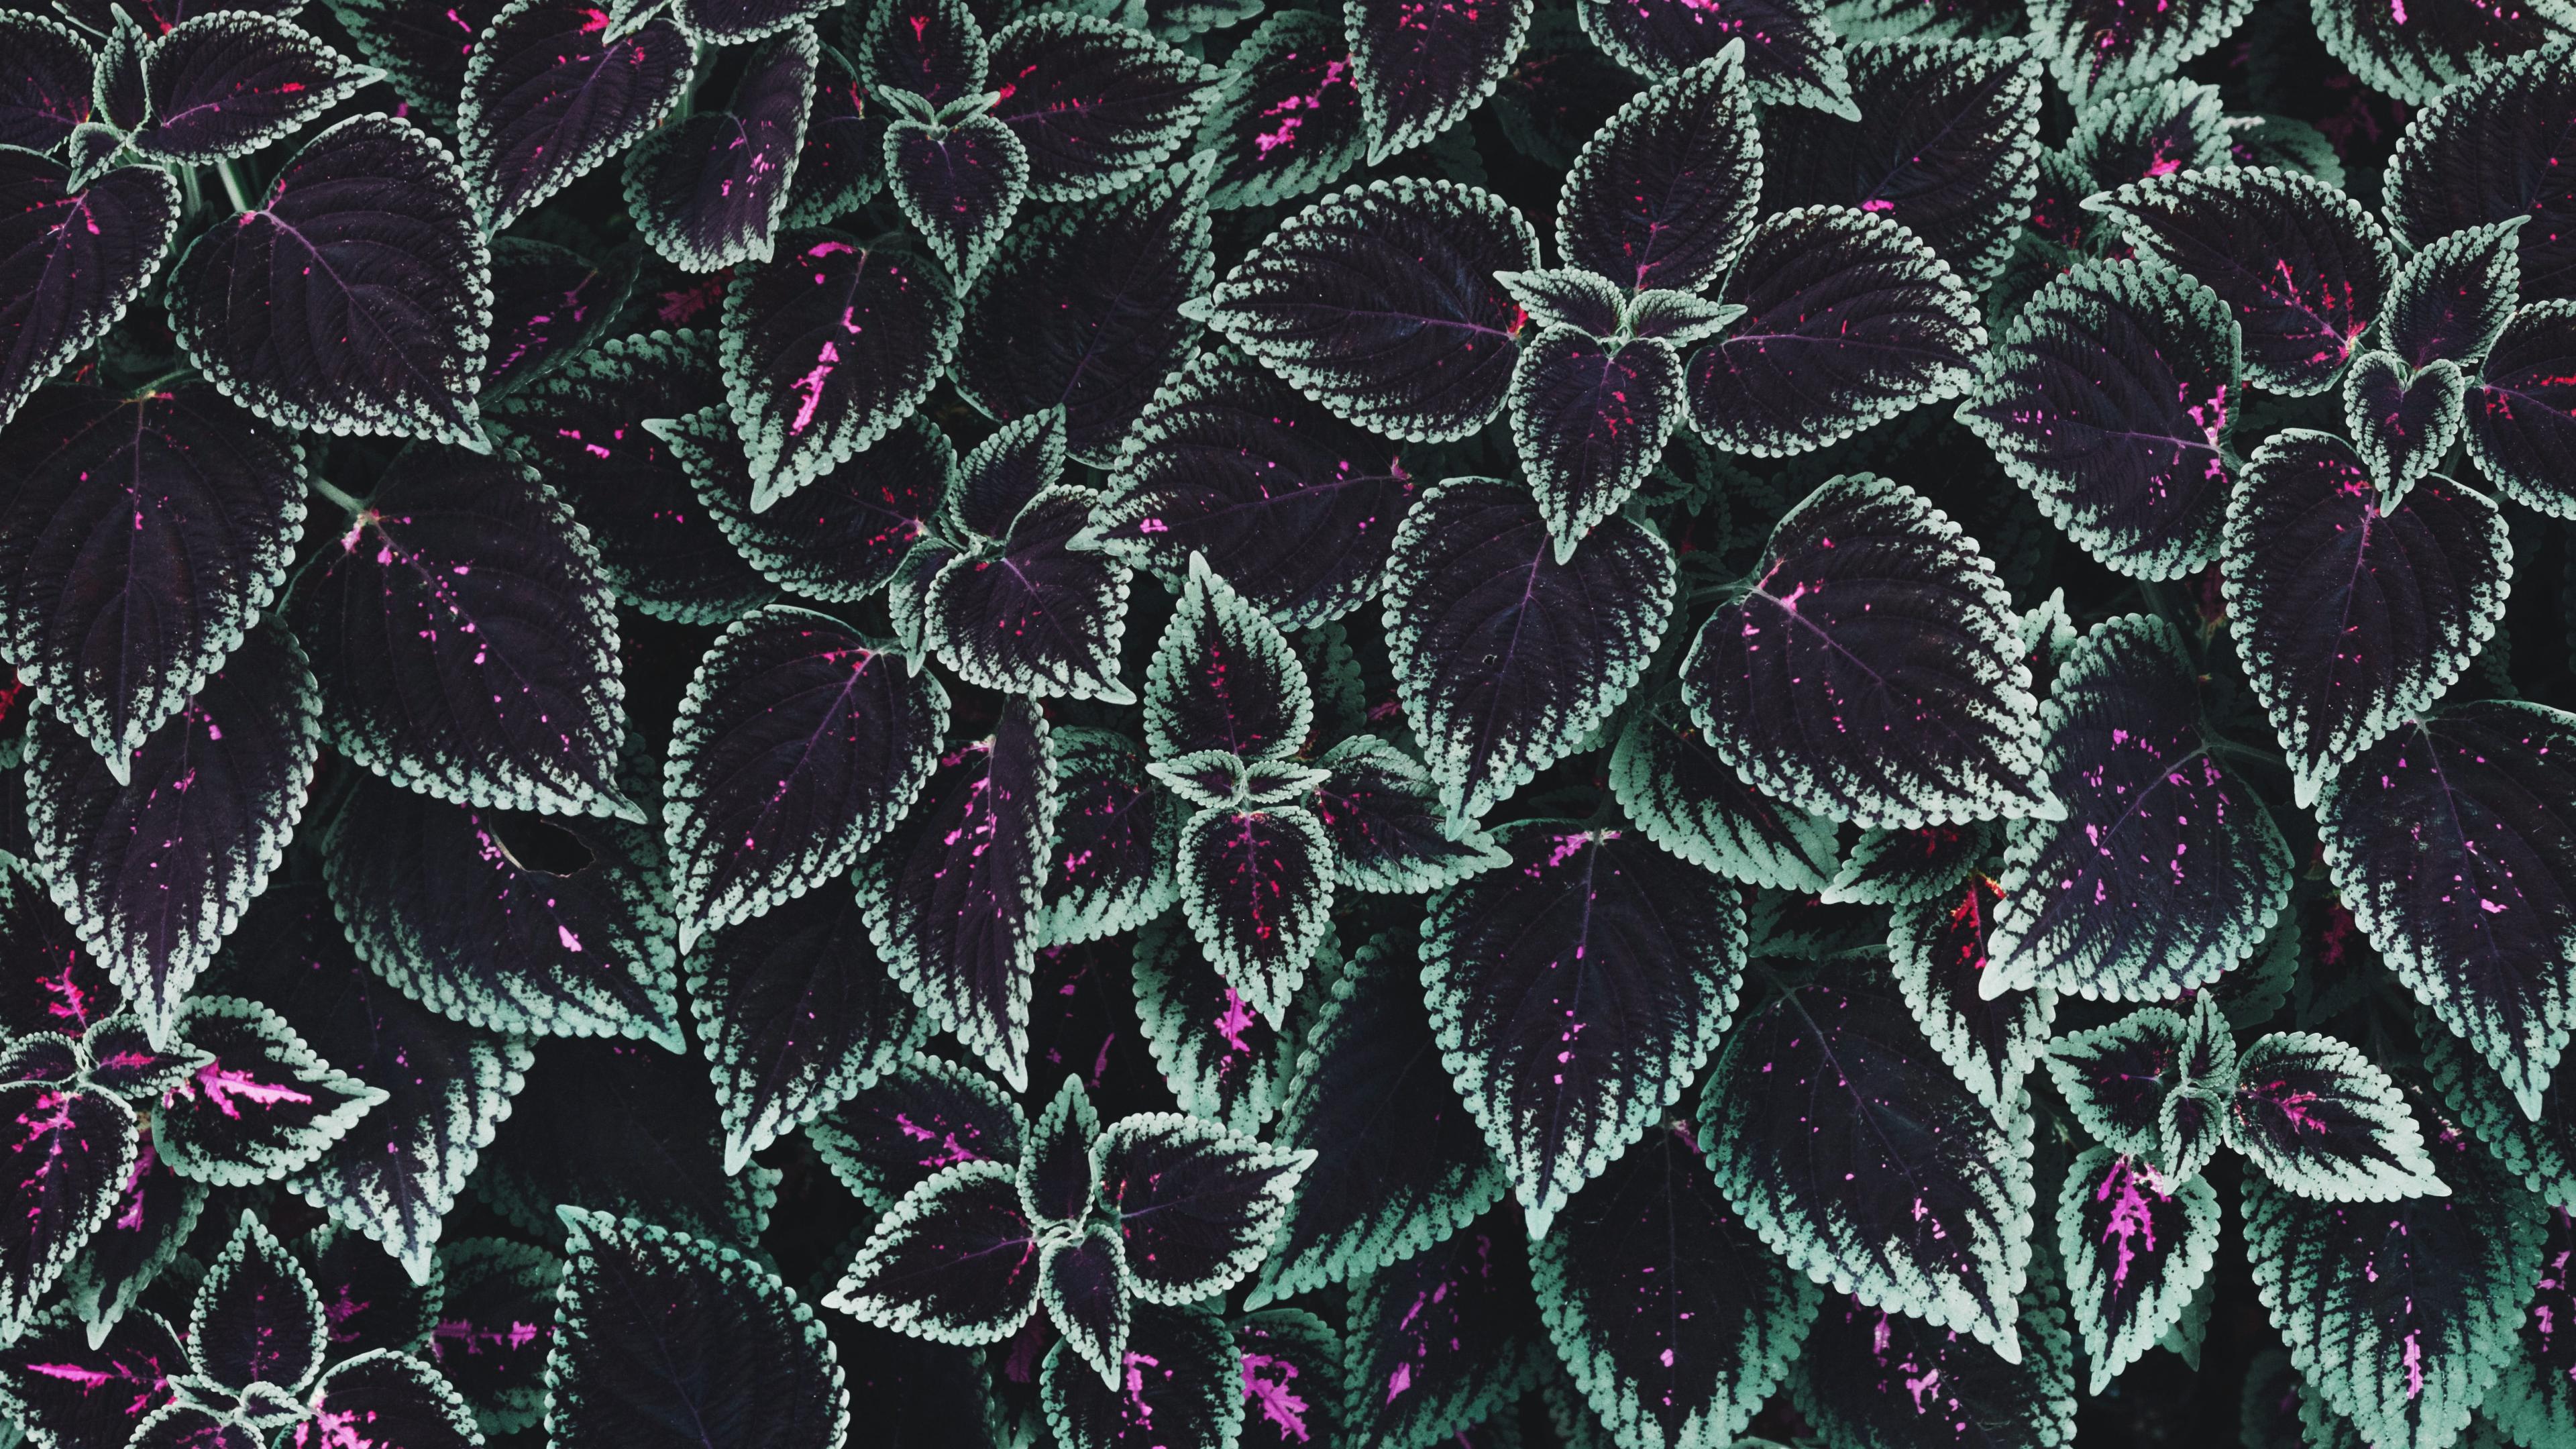 General 3840x2160 macro leaves plants foliage cyan purple coleus